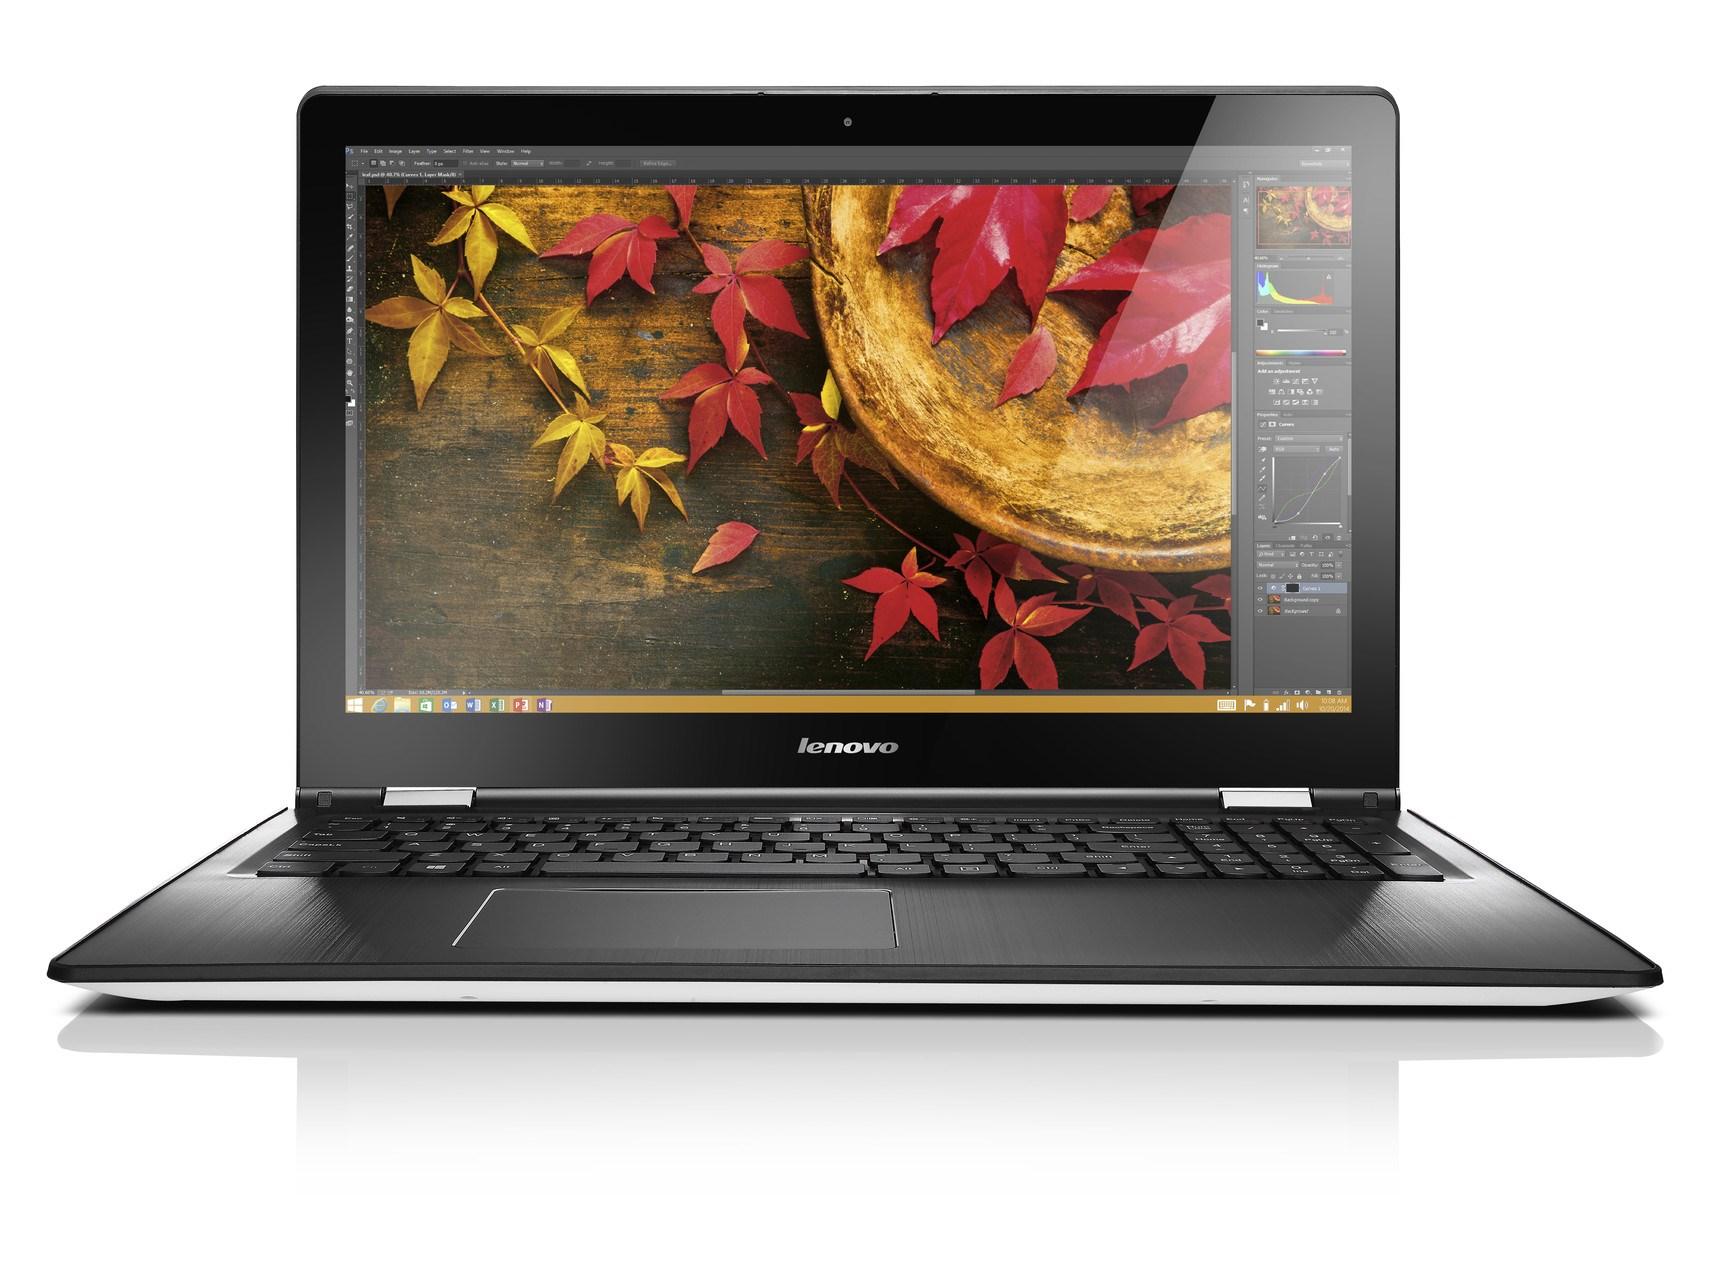 "Lenovo YOGA 500 15.6""FHD/i5-6200U/500+8/4G/INT/Win 10"